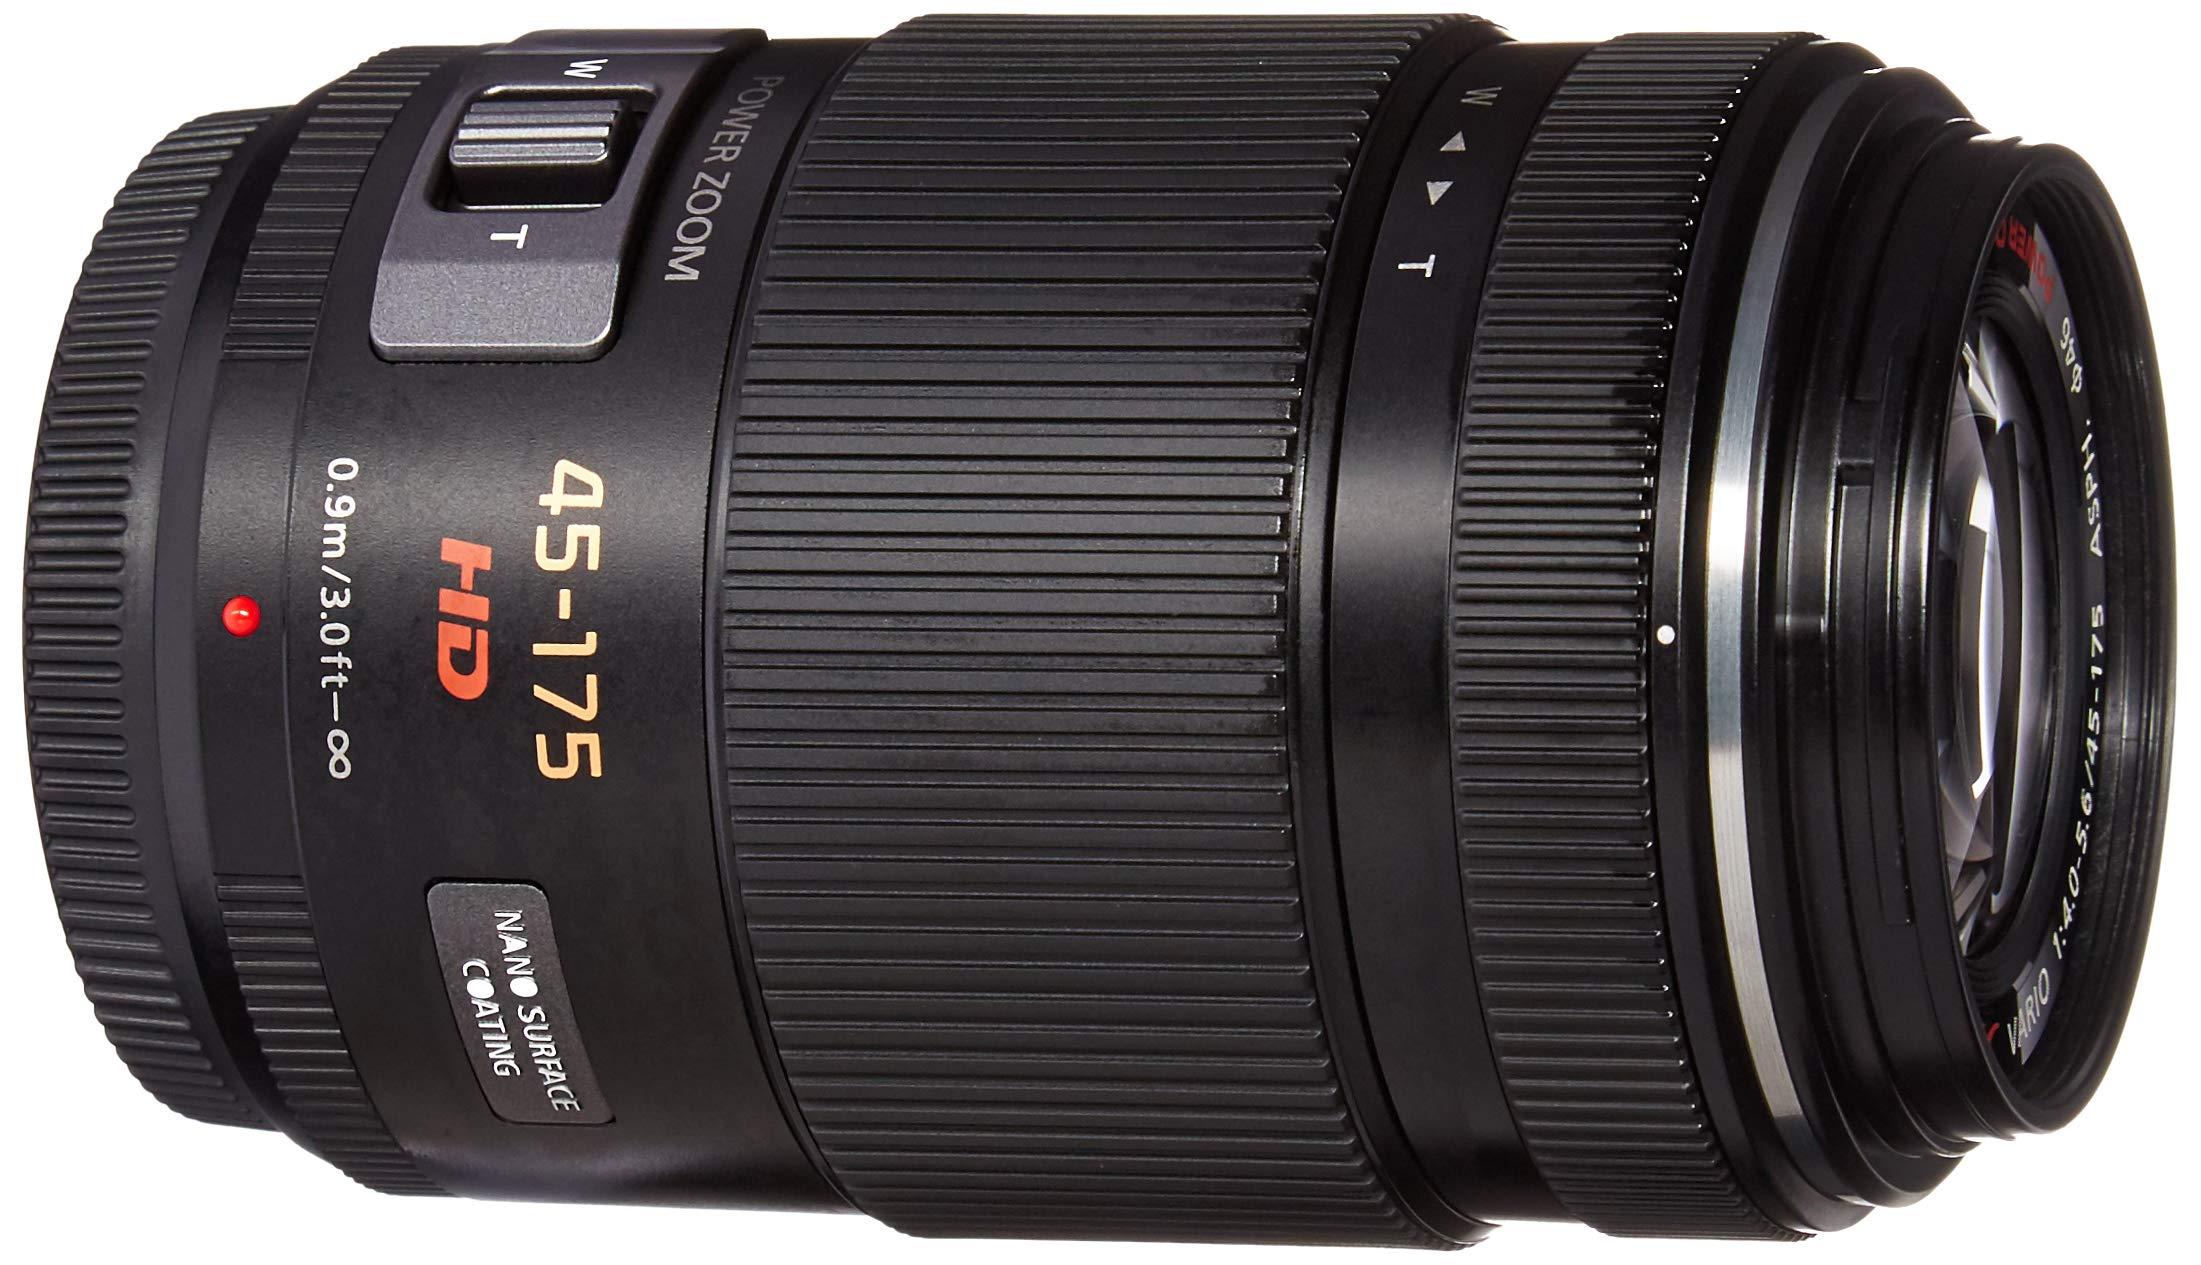 PANASONIC LUMIX G X Vario Power Zoom Lens, 45-175MM, F4.0-5.6 ASPH, MIRRORLESS Micro Four Thirds, Power Optical I.S, H-PS45175K (USA Black) by Panasonic